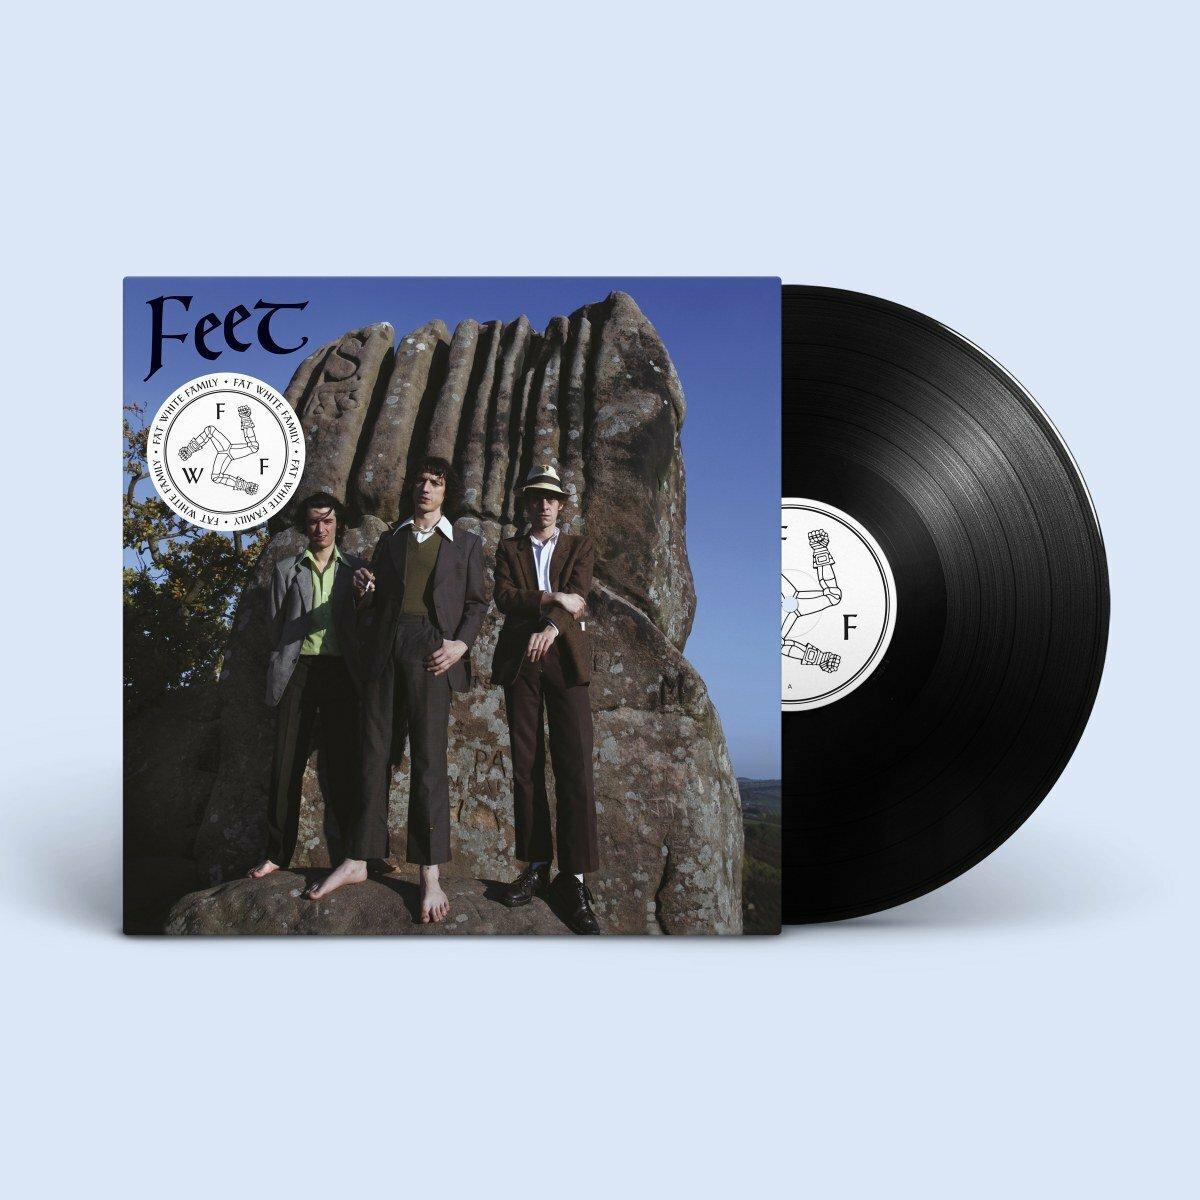 Fat White Family / Feet(1000 Ltd 12inch Single)